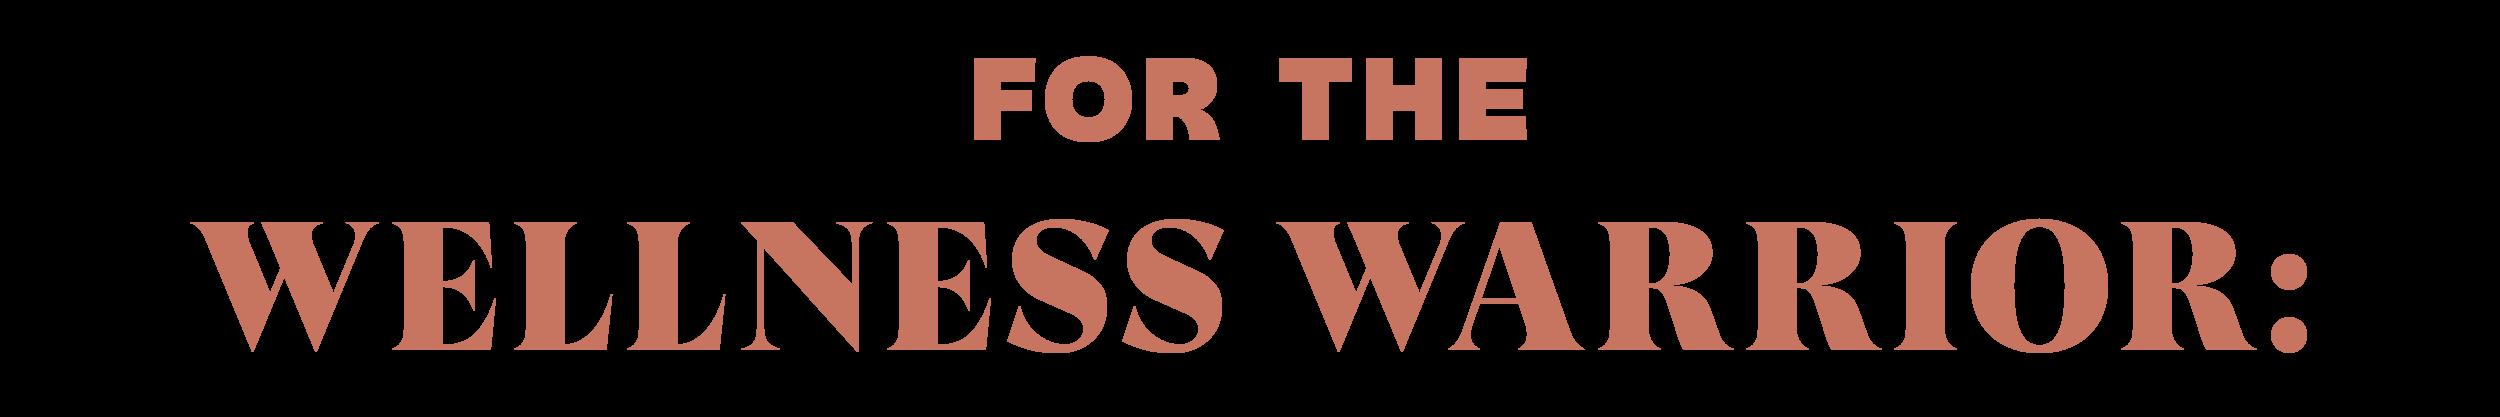 wellnesswarrior.png